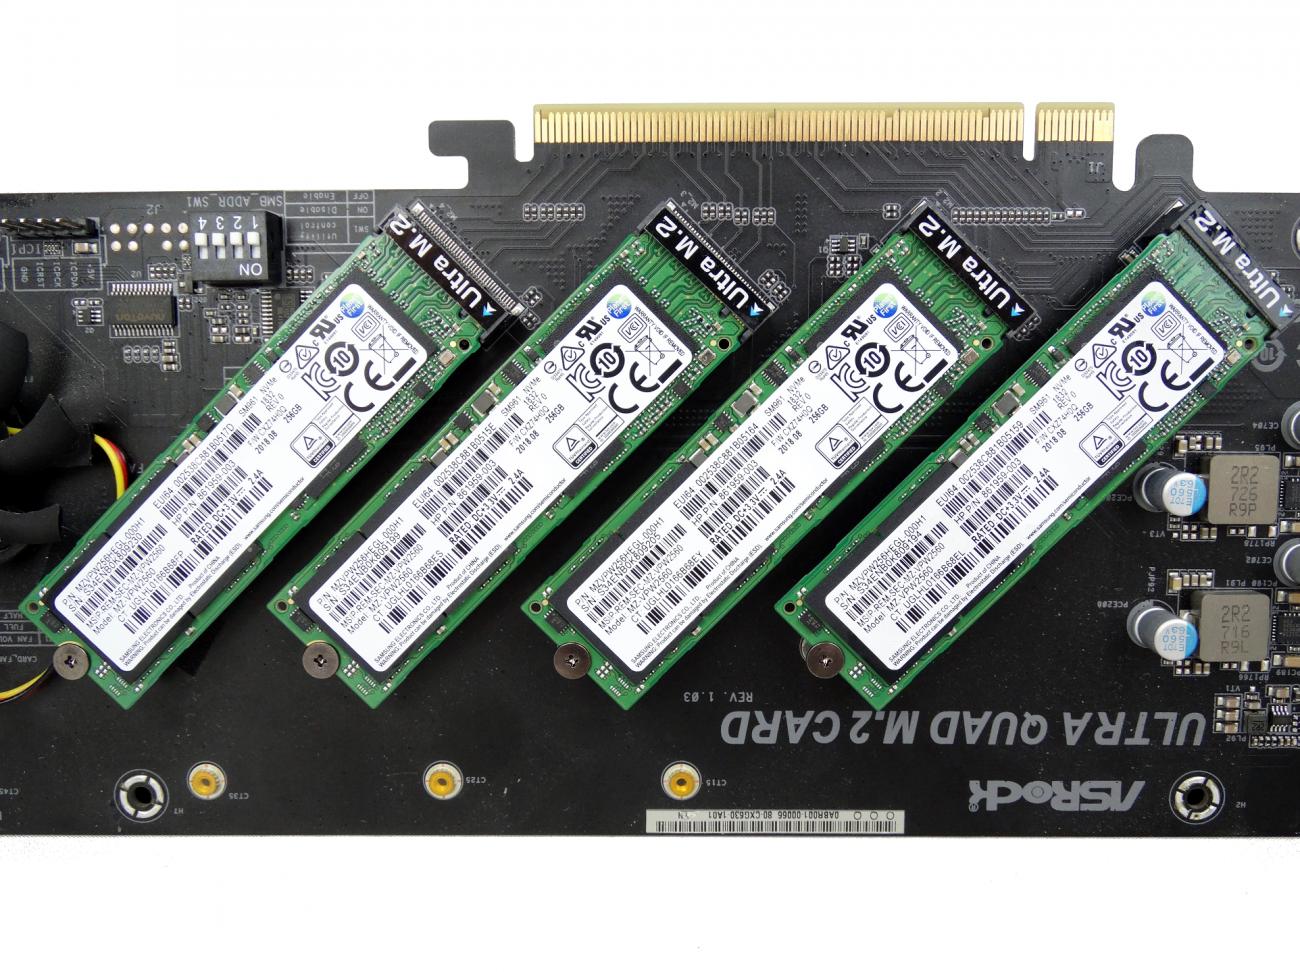 Cheap Samsung Sm961 Nvme Vroc Raid Ssd Performance Ssd Samsung System Memory